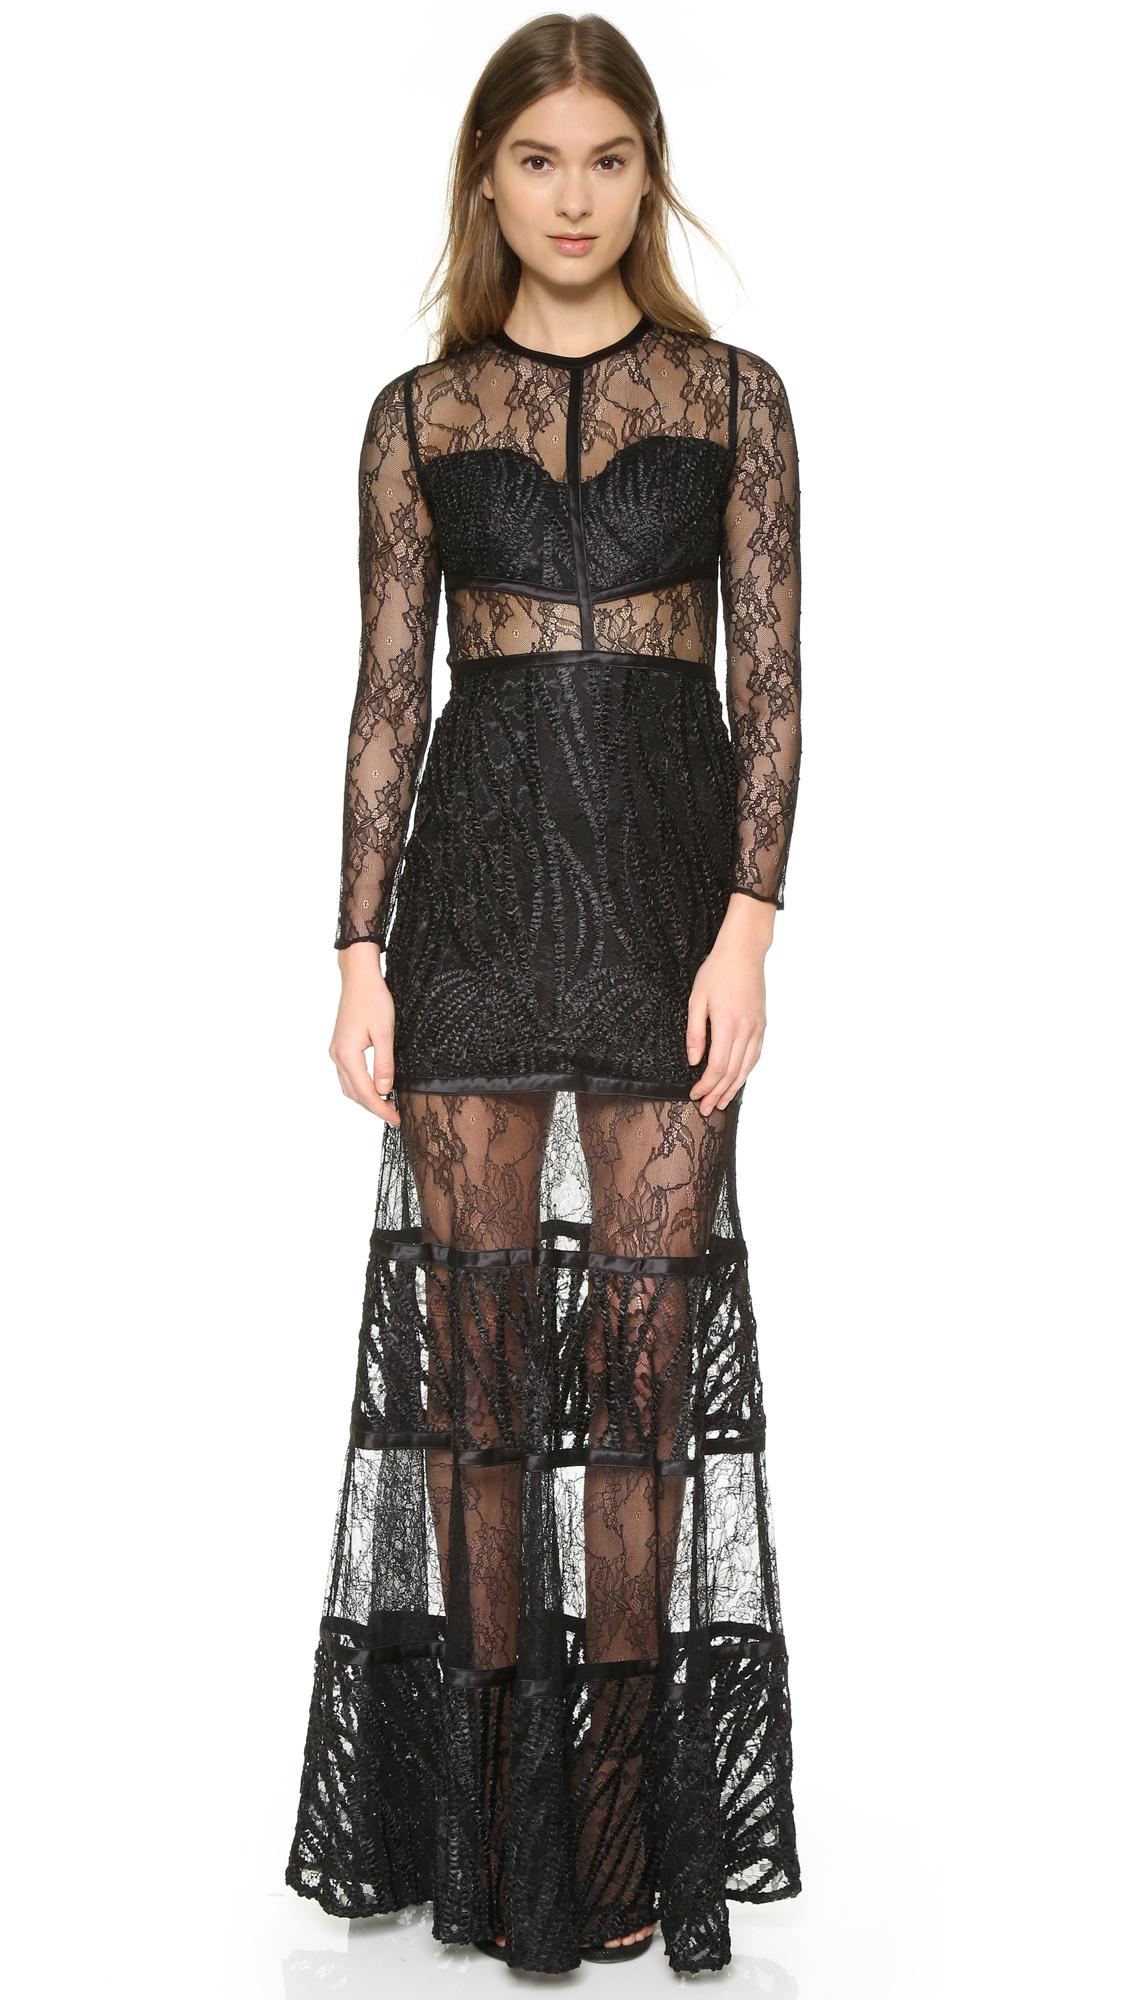 Lyst - Alexis Joelle Gown in Black